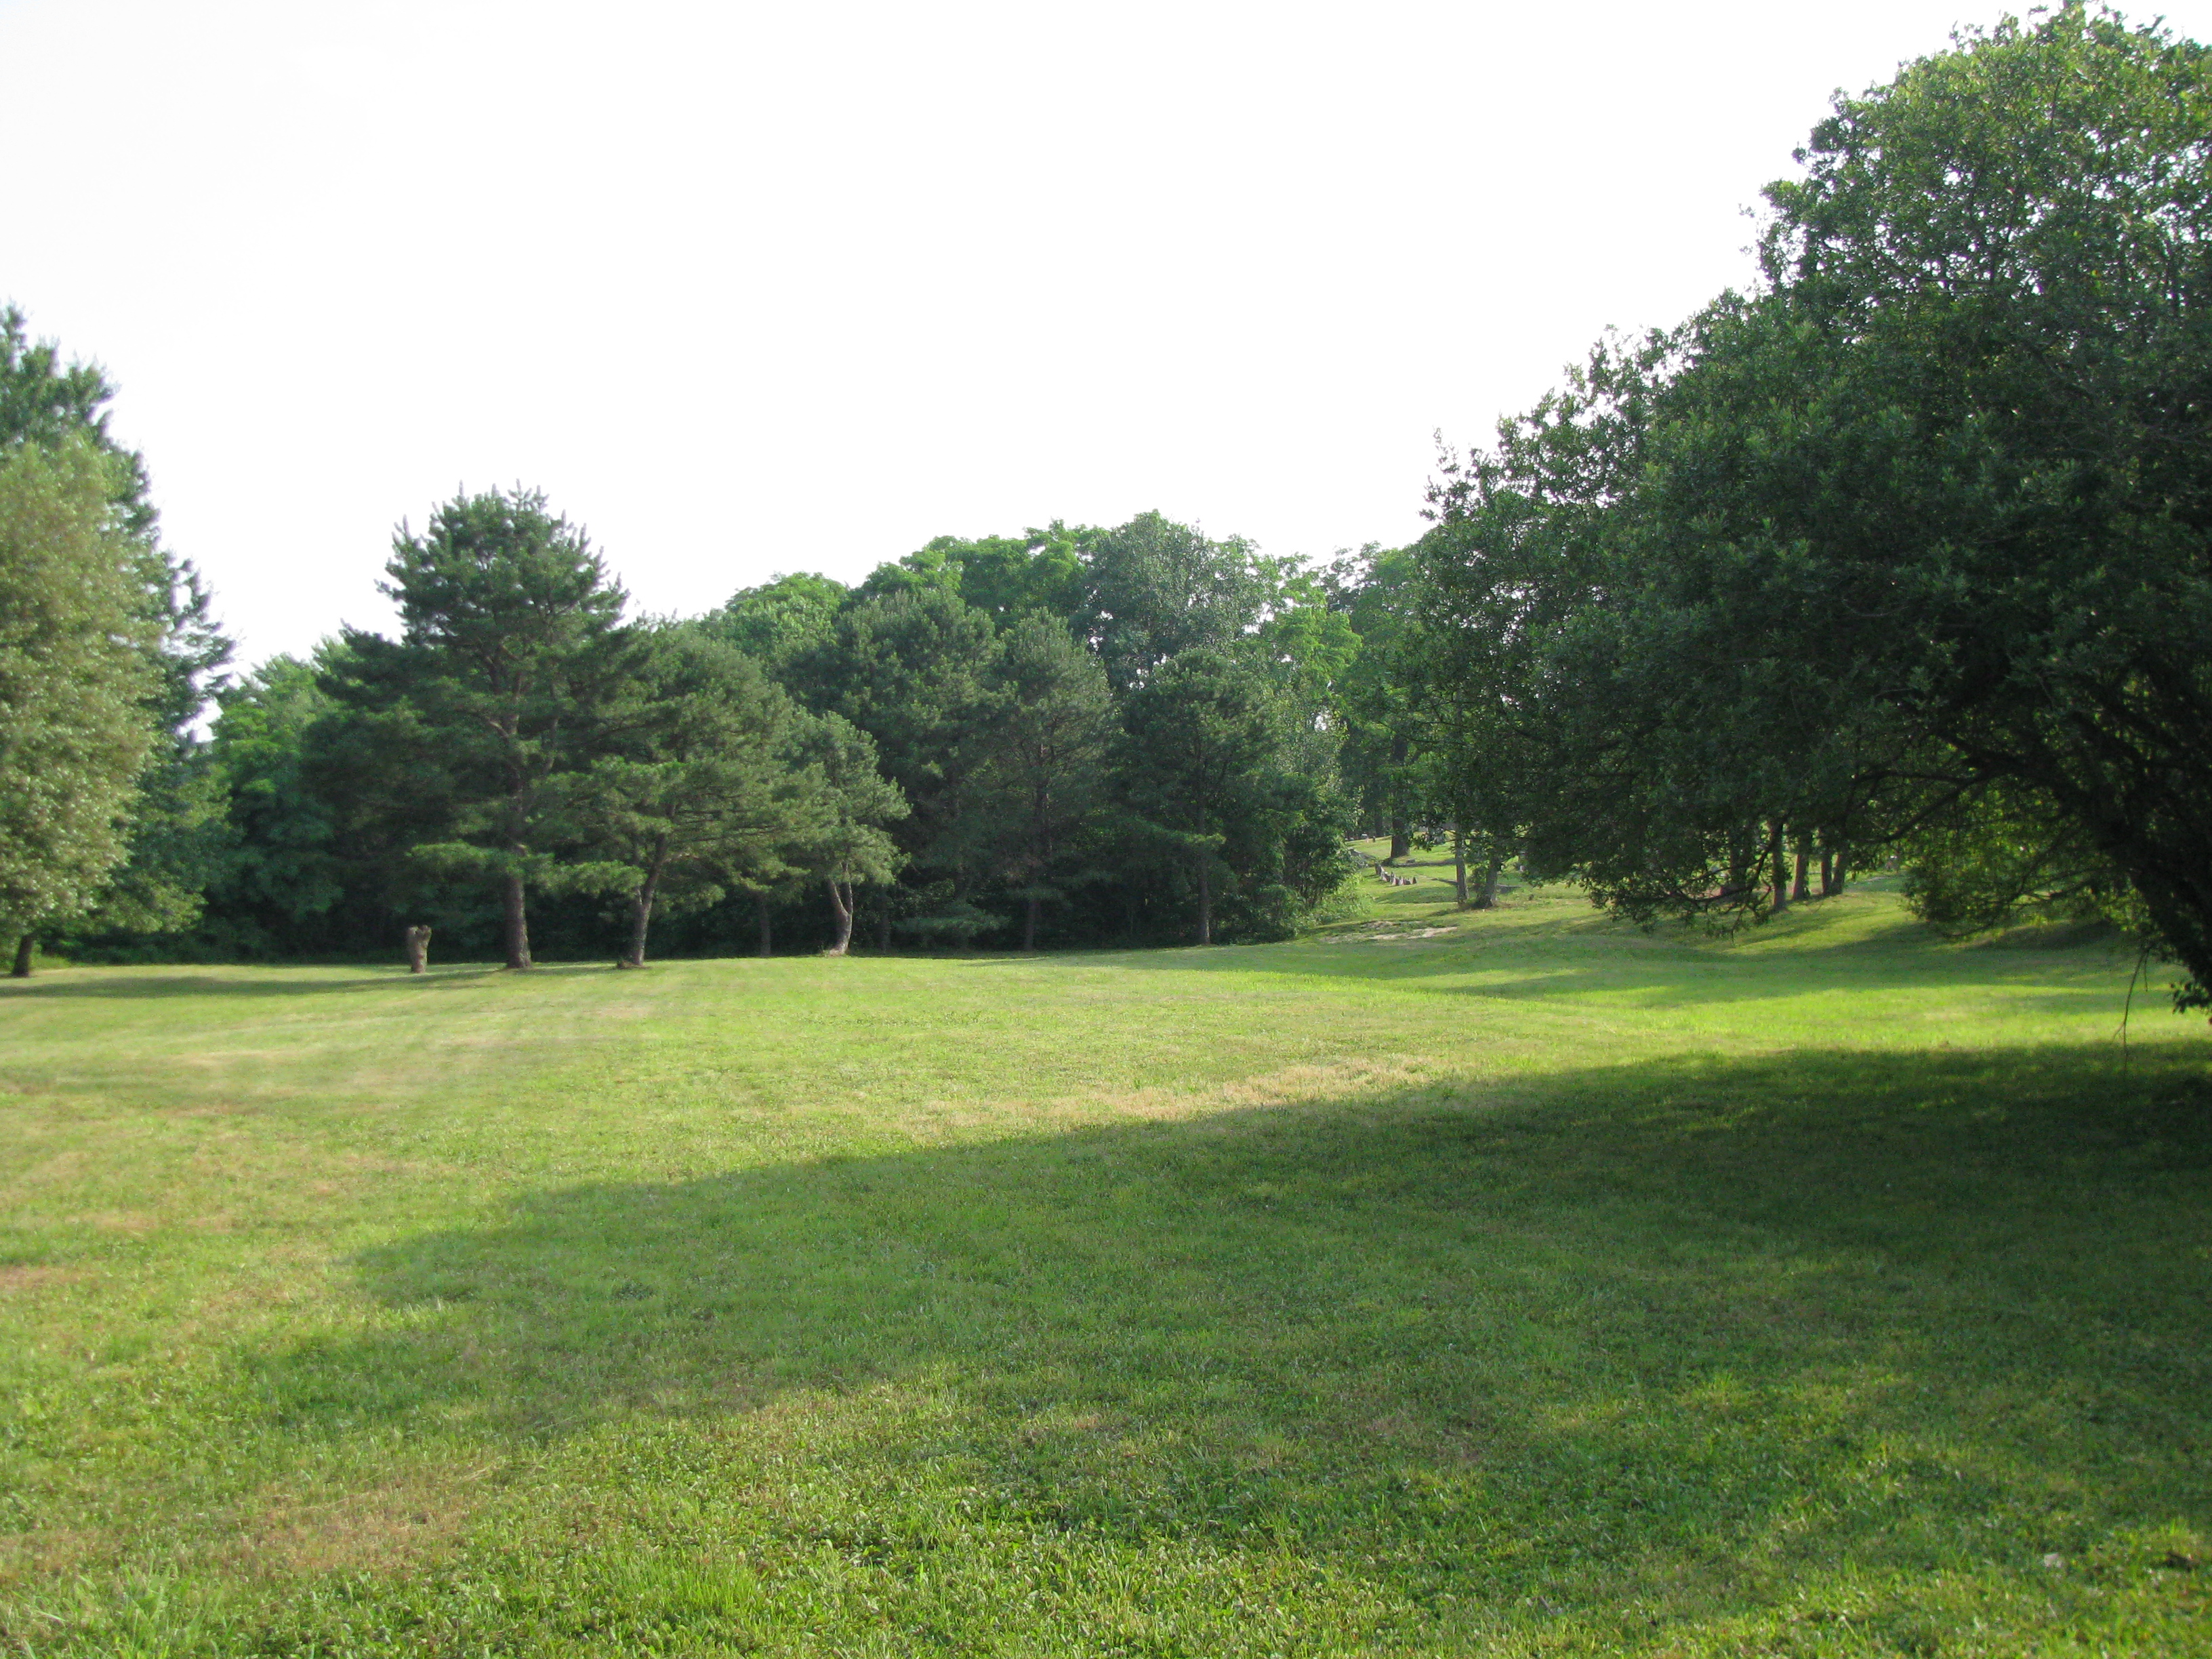 Mount Prospect Cemetery image 4